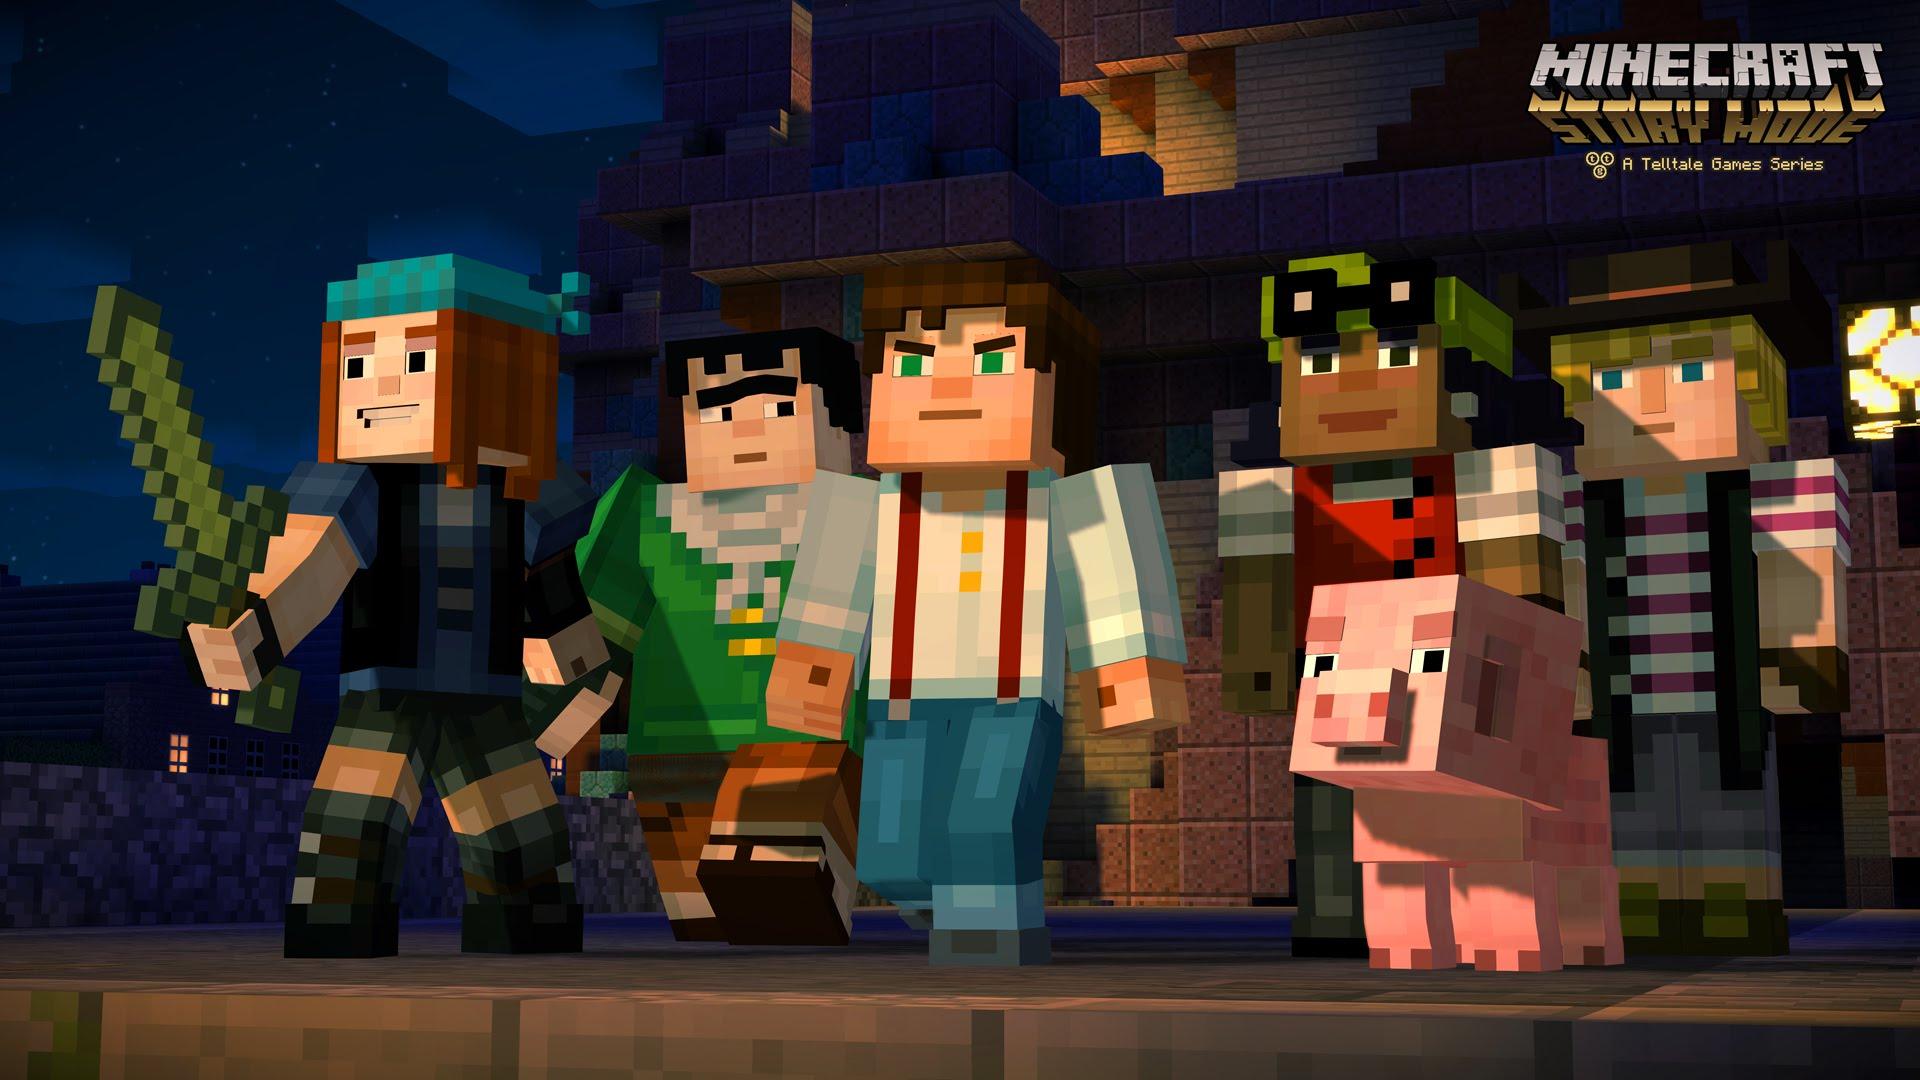 Games/Apps: LEGO Jurassic World from $30, Lara Croft Go gets